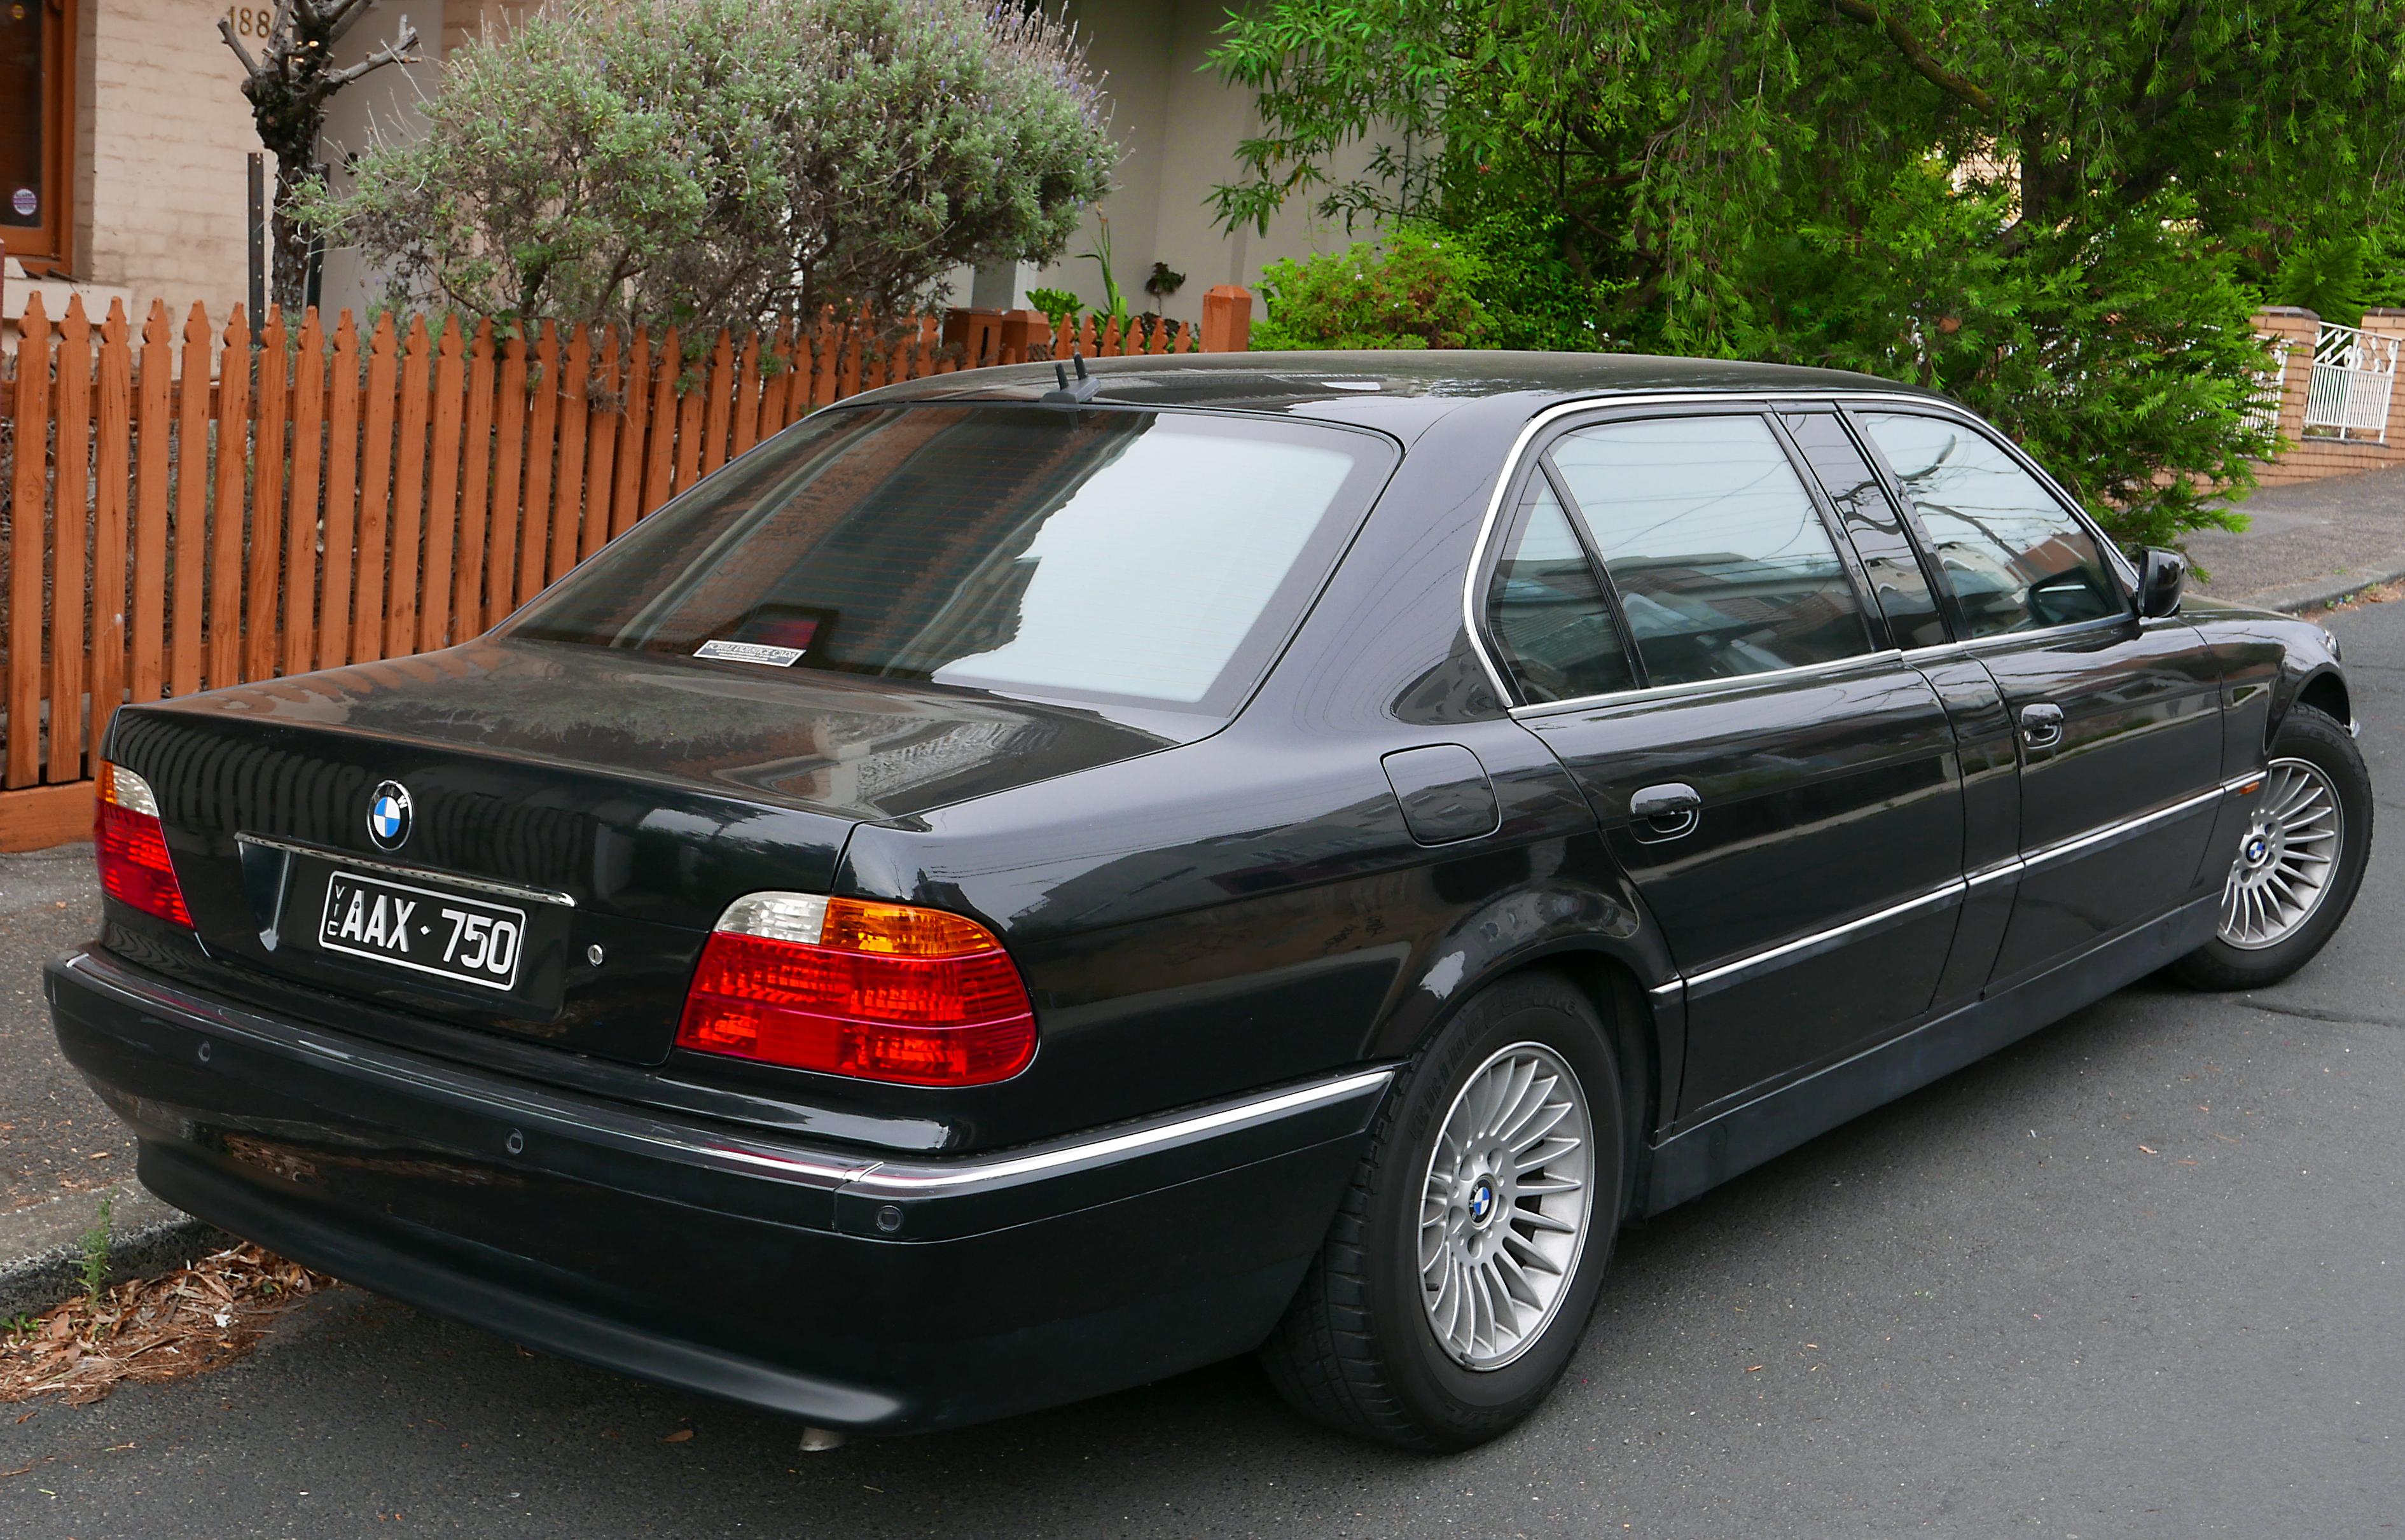 File:2001 BMW L7 (E38) sedan (2015-02-13) 02.jpg - Wikimedia Commons